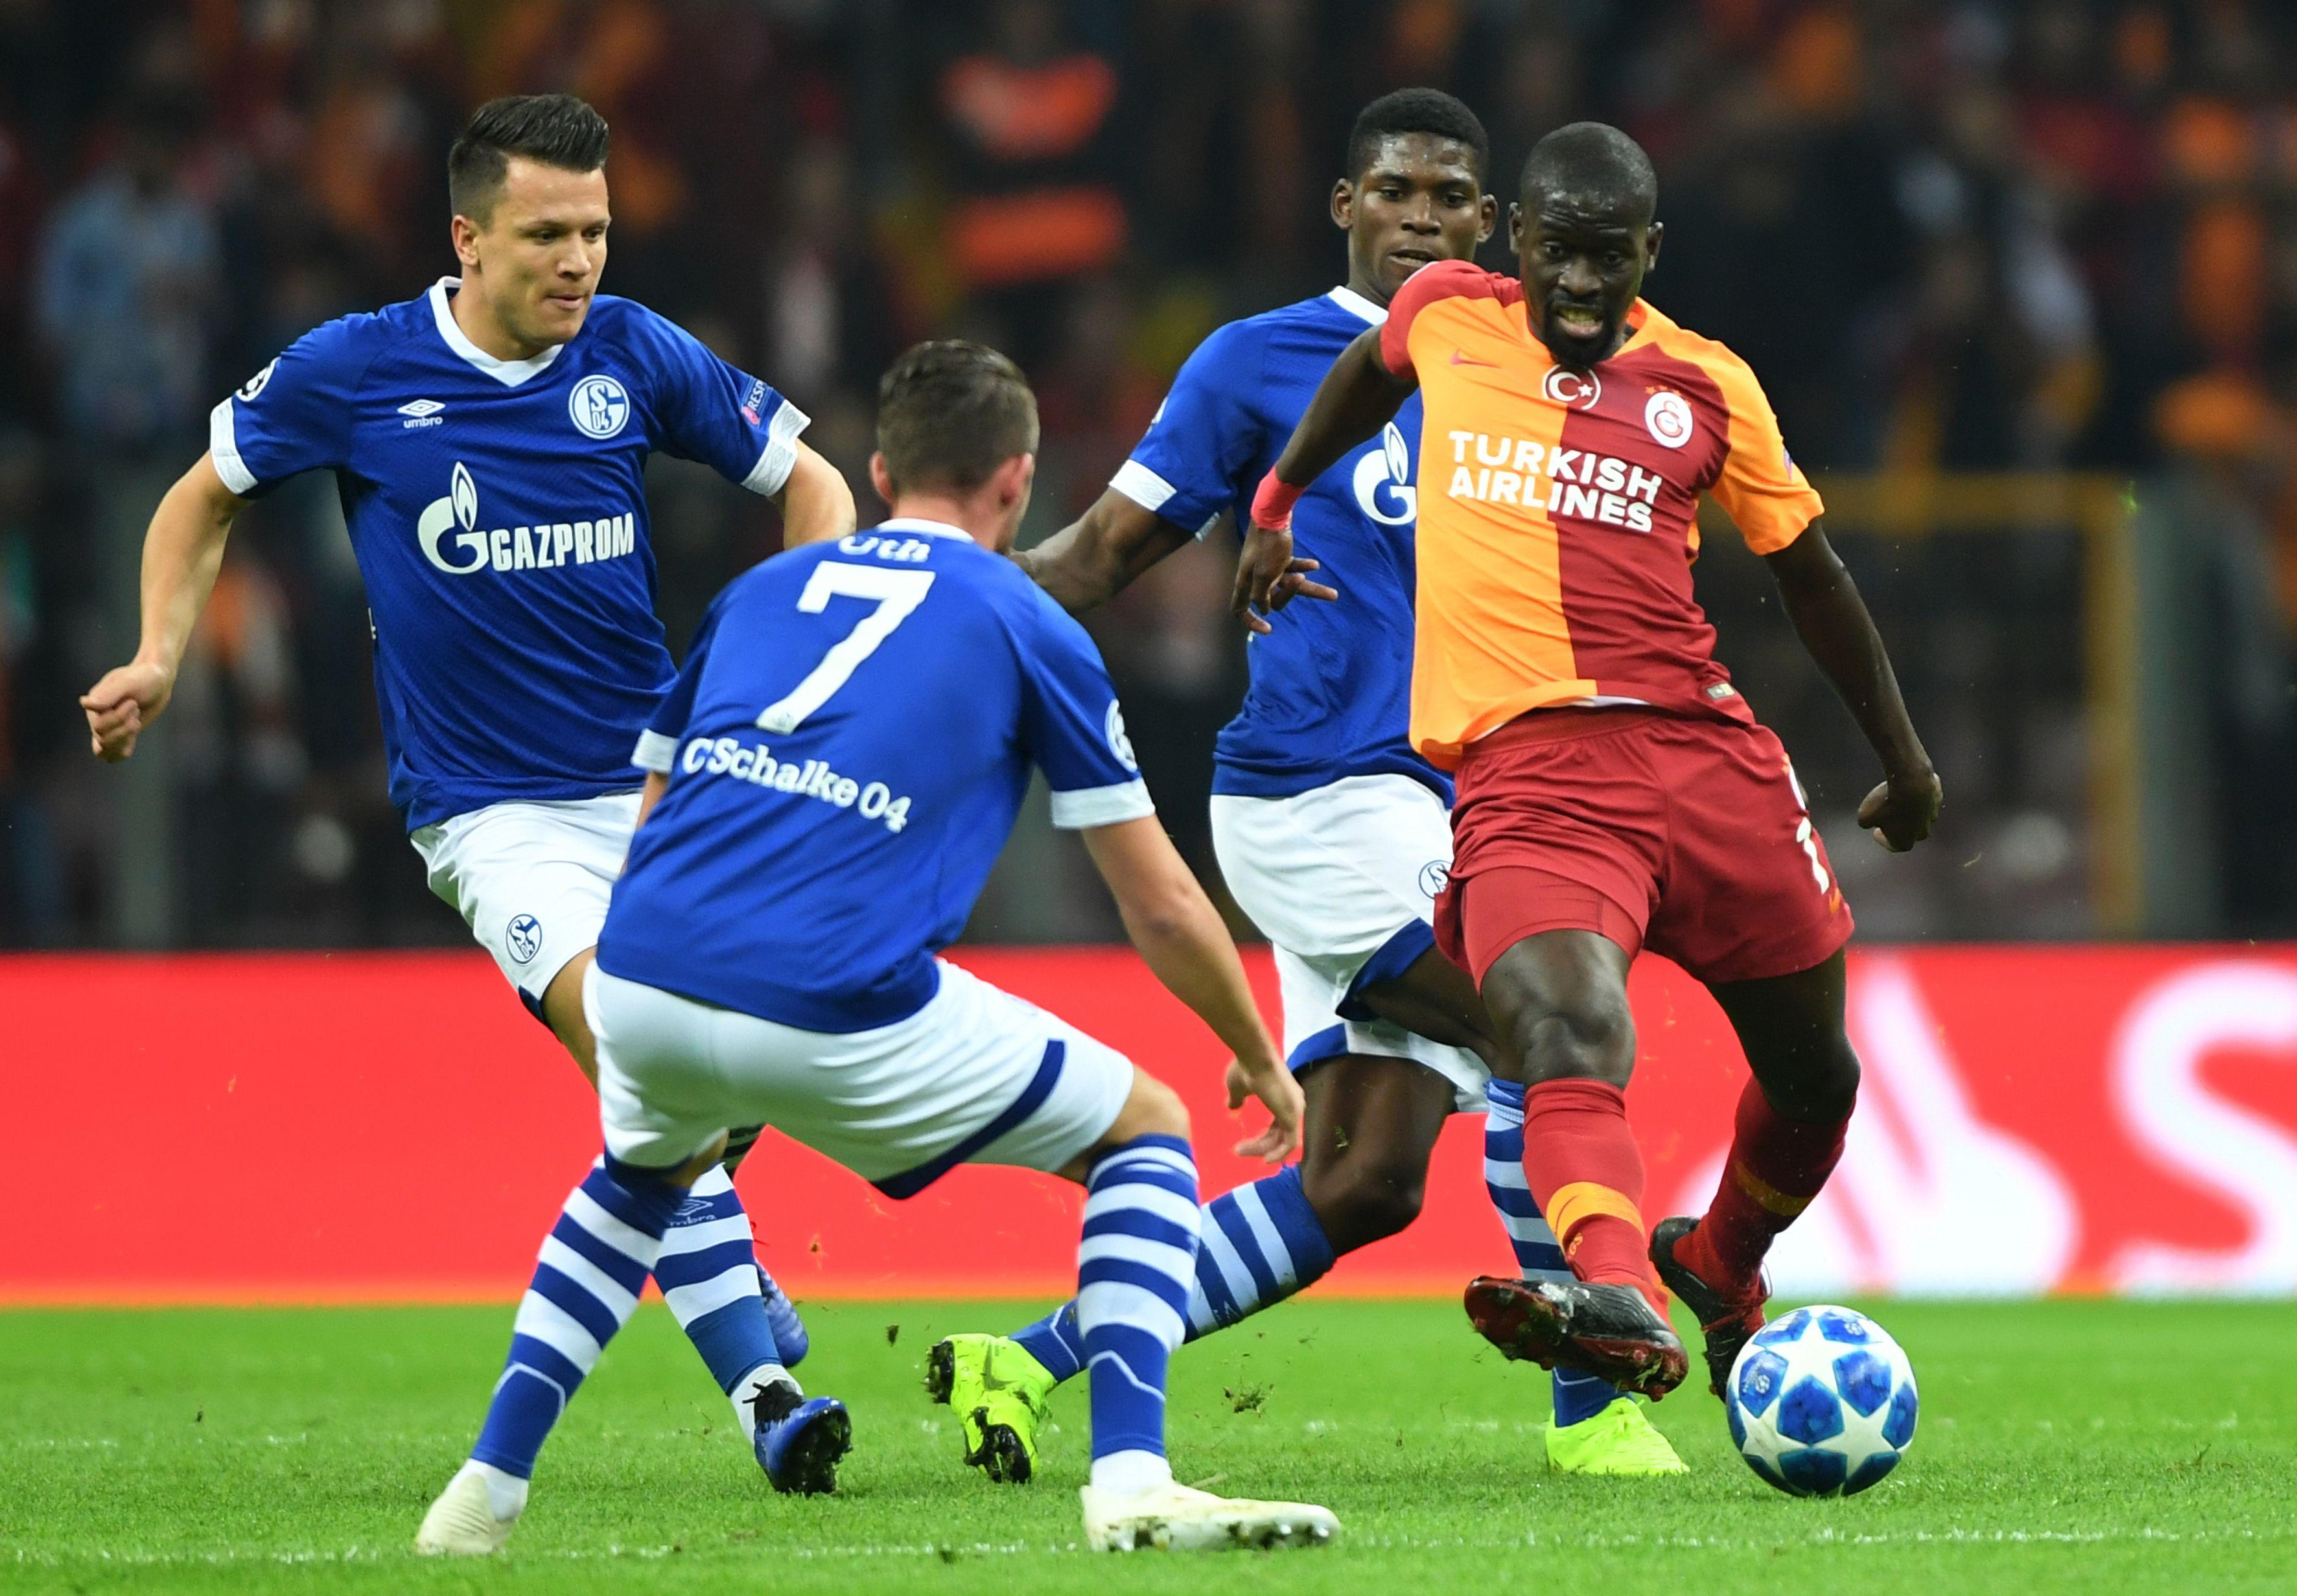 Galatasaray Schalke Live